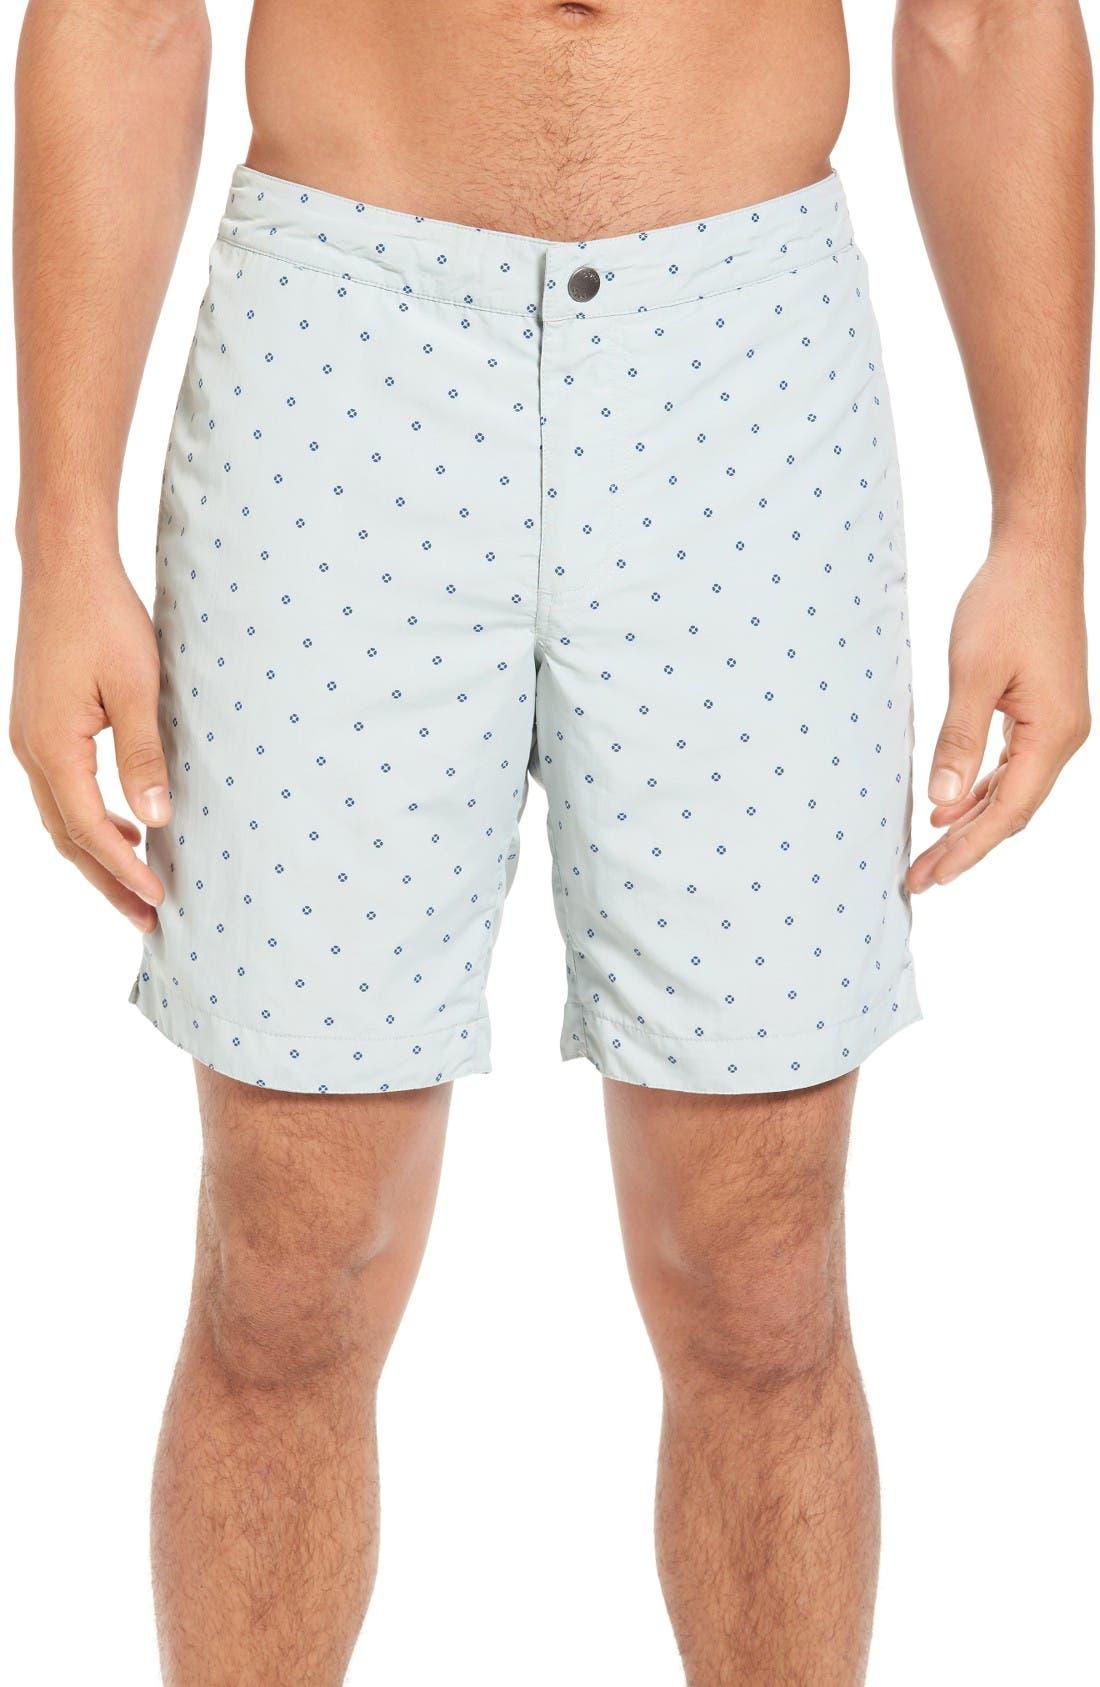 boto Aruba Tailored Fit 8.5 Inch Board Shorts